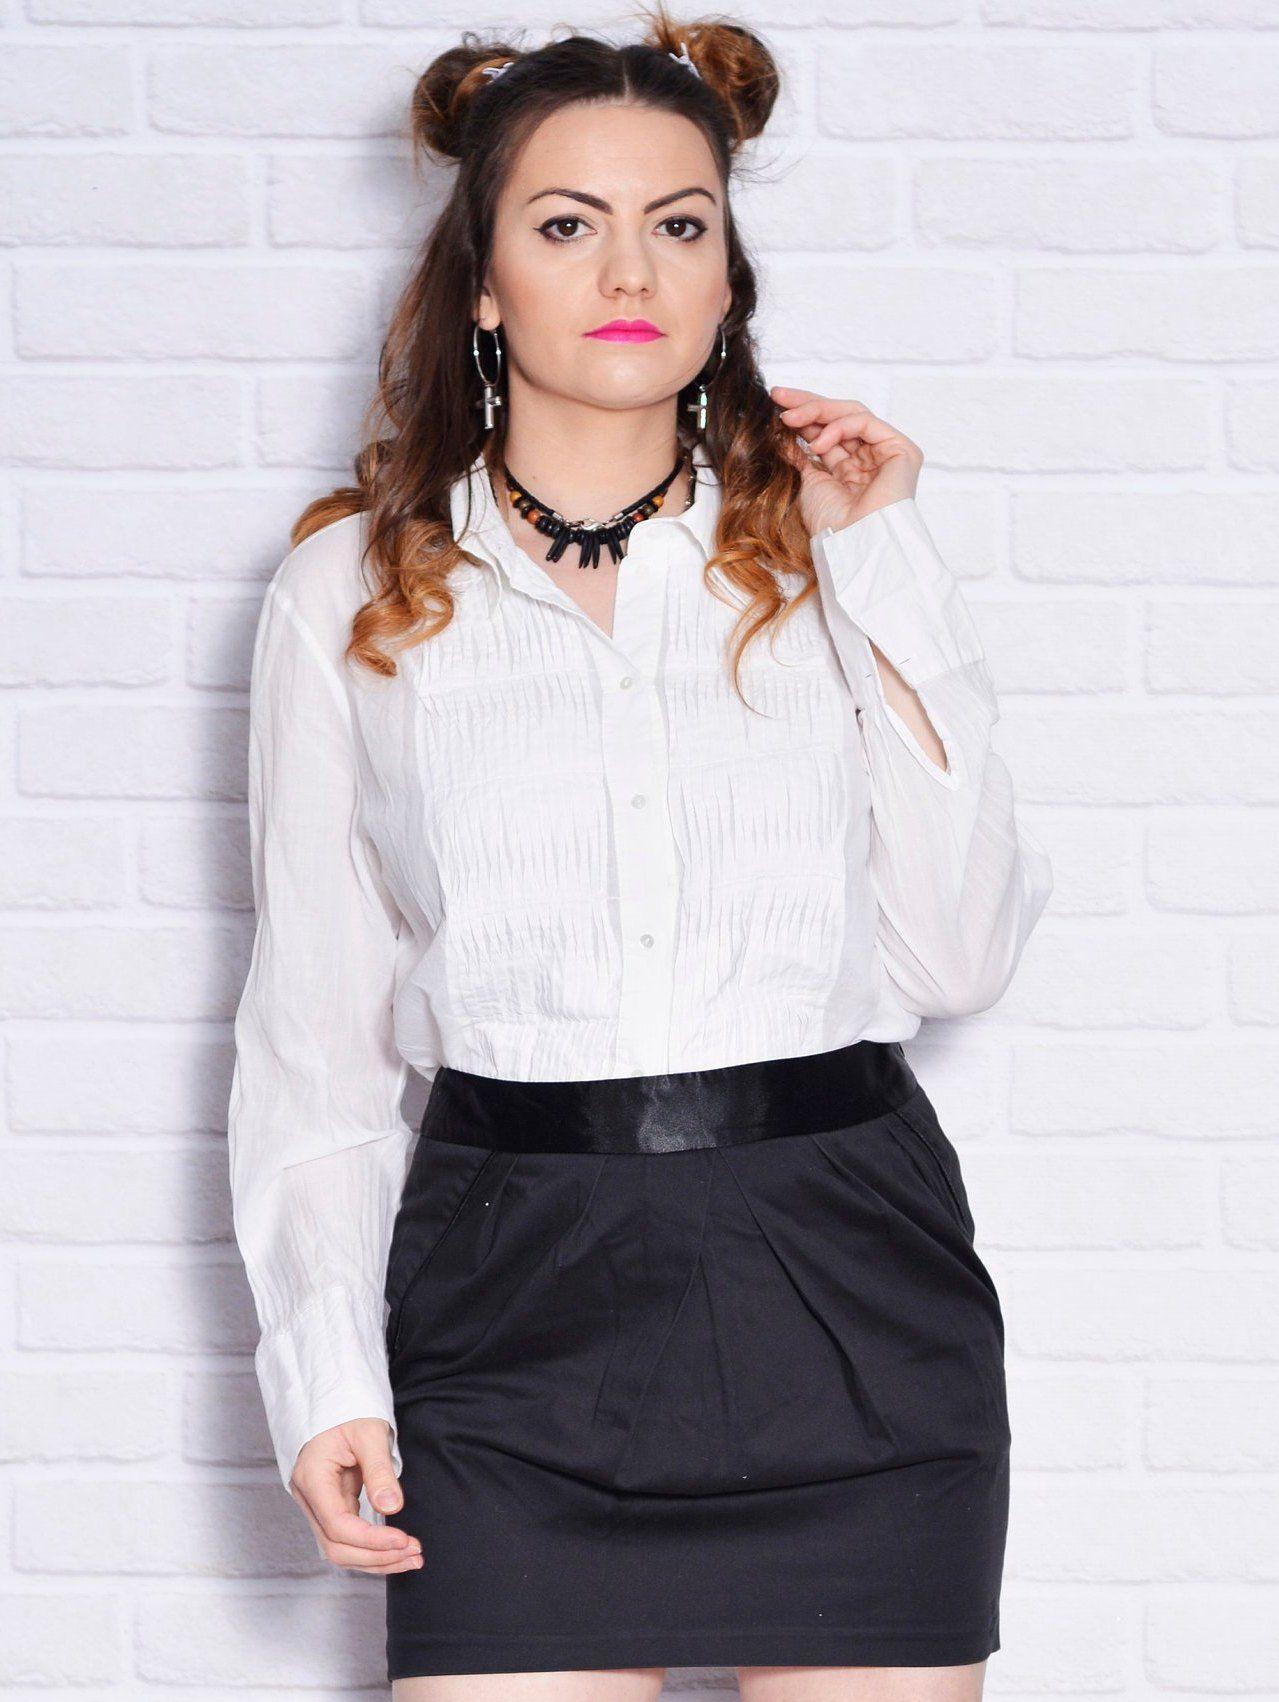 Betere White Tuxedo Shirt 90s Semi Sheer Blouse Cotton Long Sleeve | Etsy QH-34